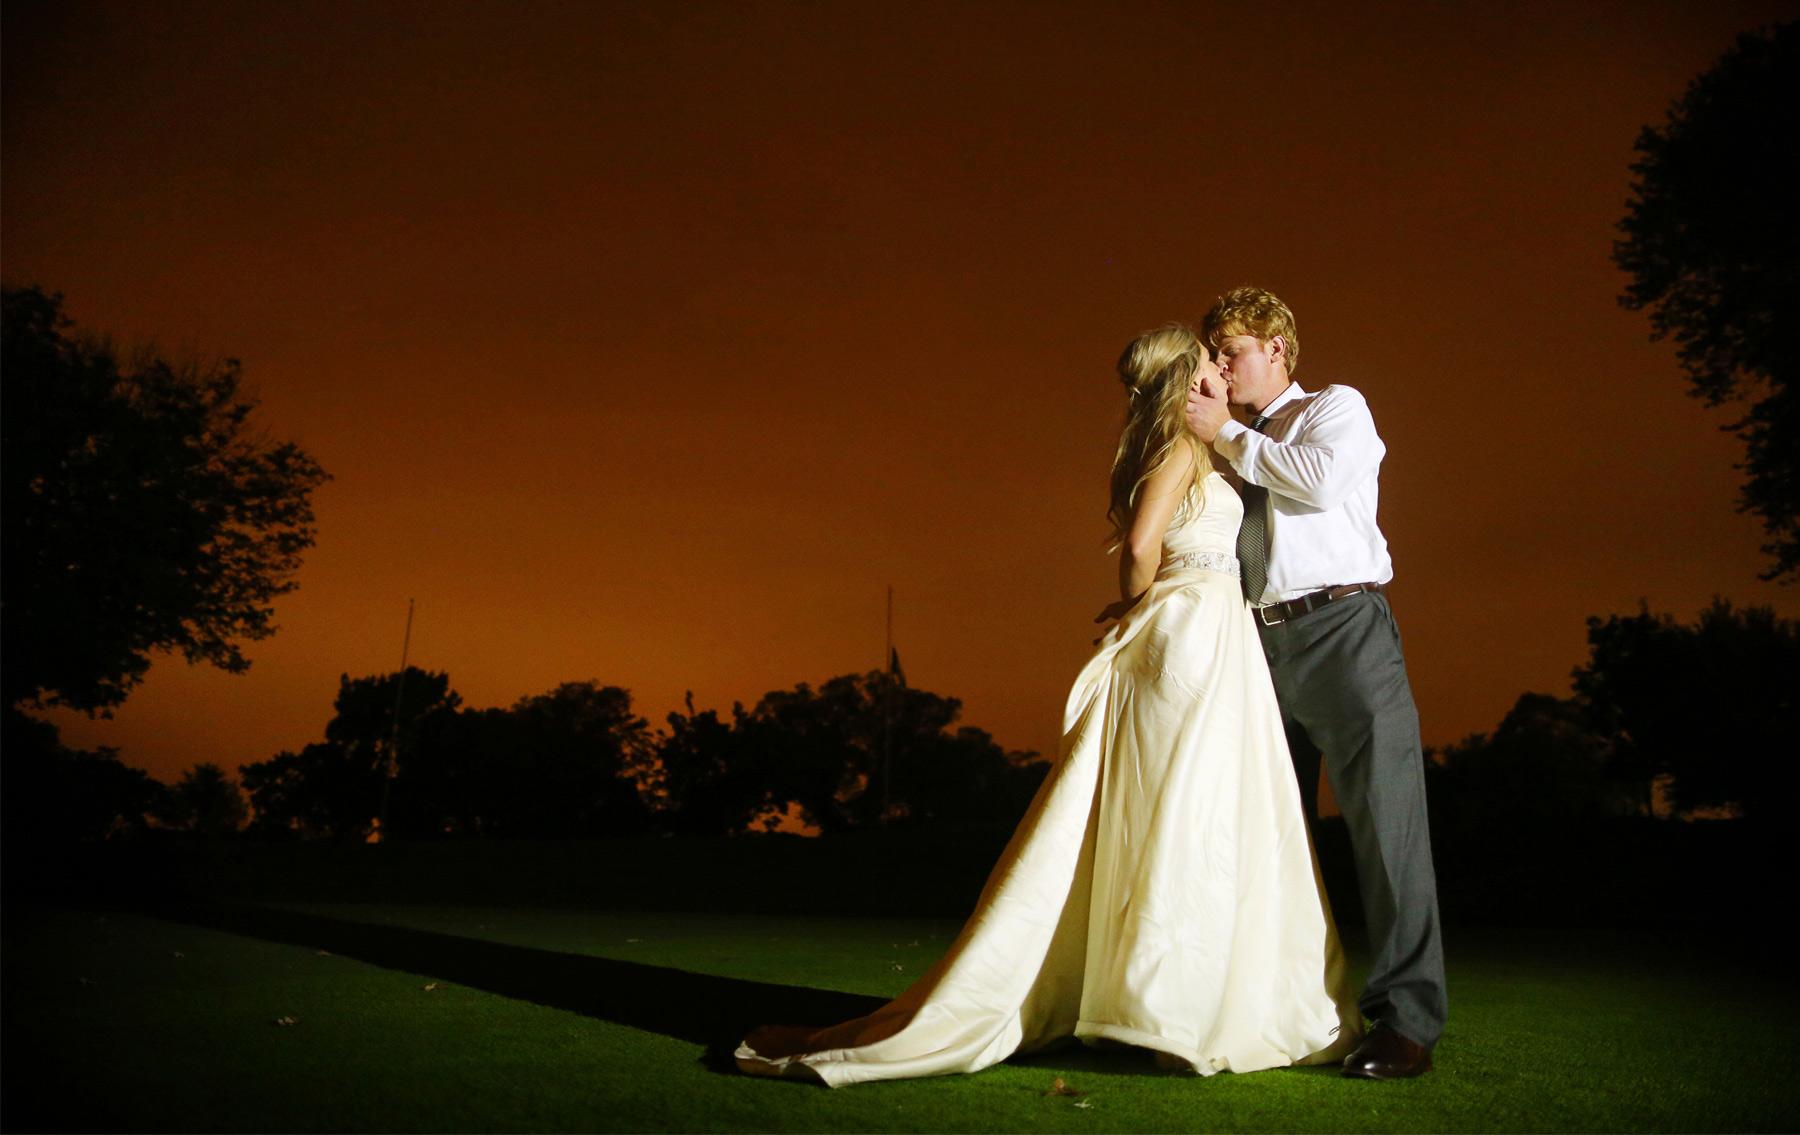 24-Minneapolis-Minnesota-Wedding-Photographer-by-Andrew-Vick-Photography-Fall-Autumn-Minikahda-Club-Golf-Course-Night-Kiss-Krissy-and-James.jpg